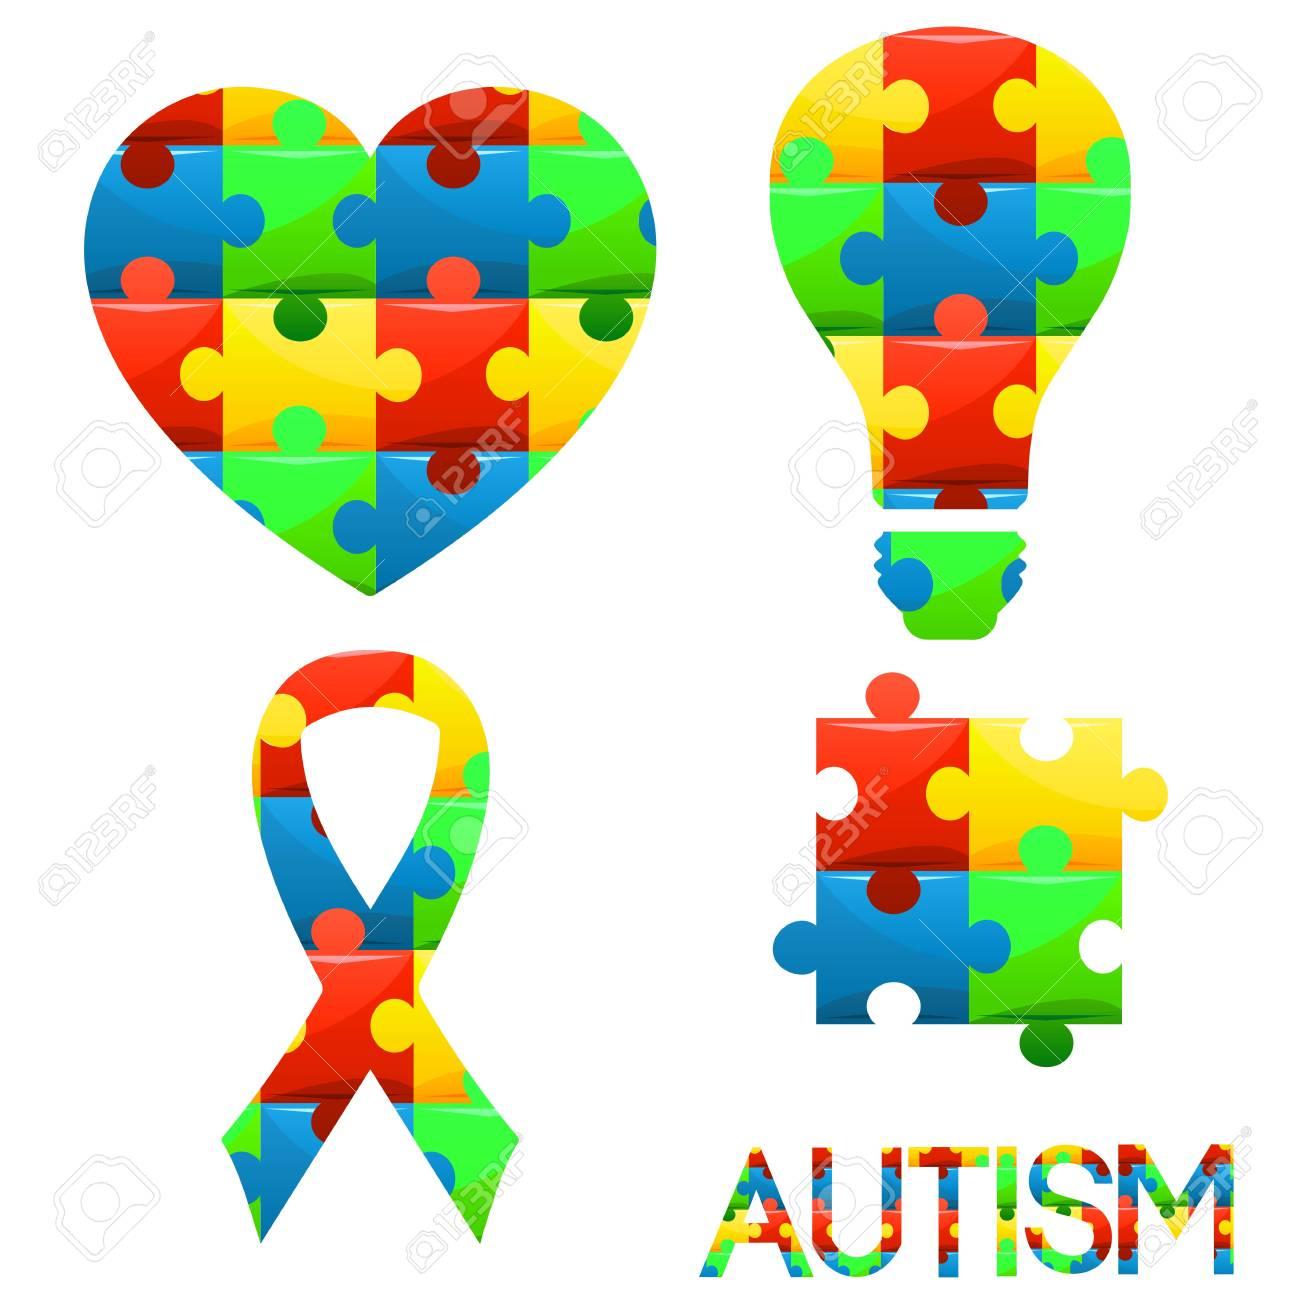 World autism awareness symbols set heart ribbonlight bulb world autism awareness symbols set heart ribbonlight bulb and puzzle pieces in biocorpaavc Gallery